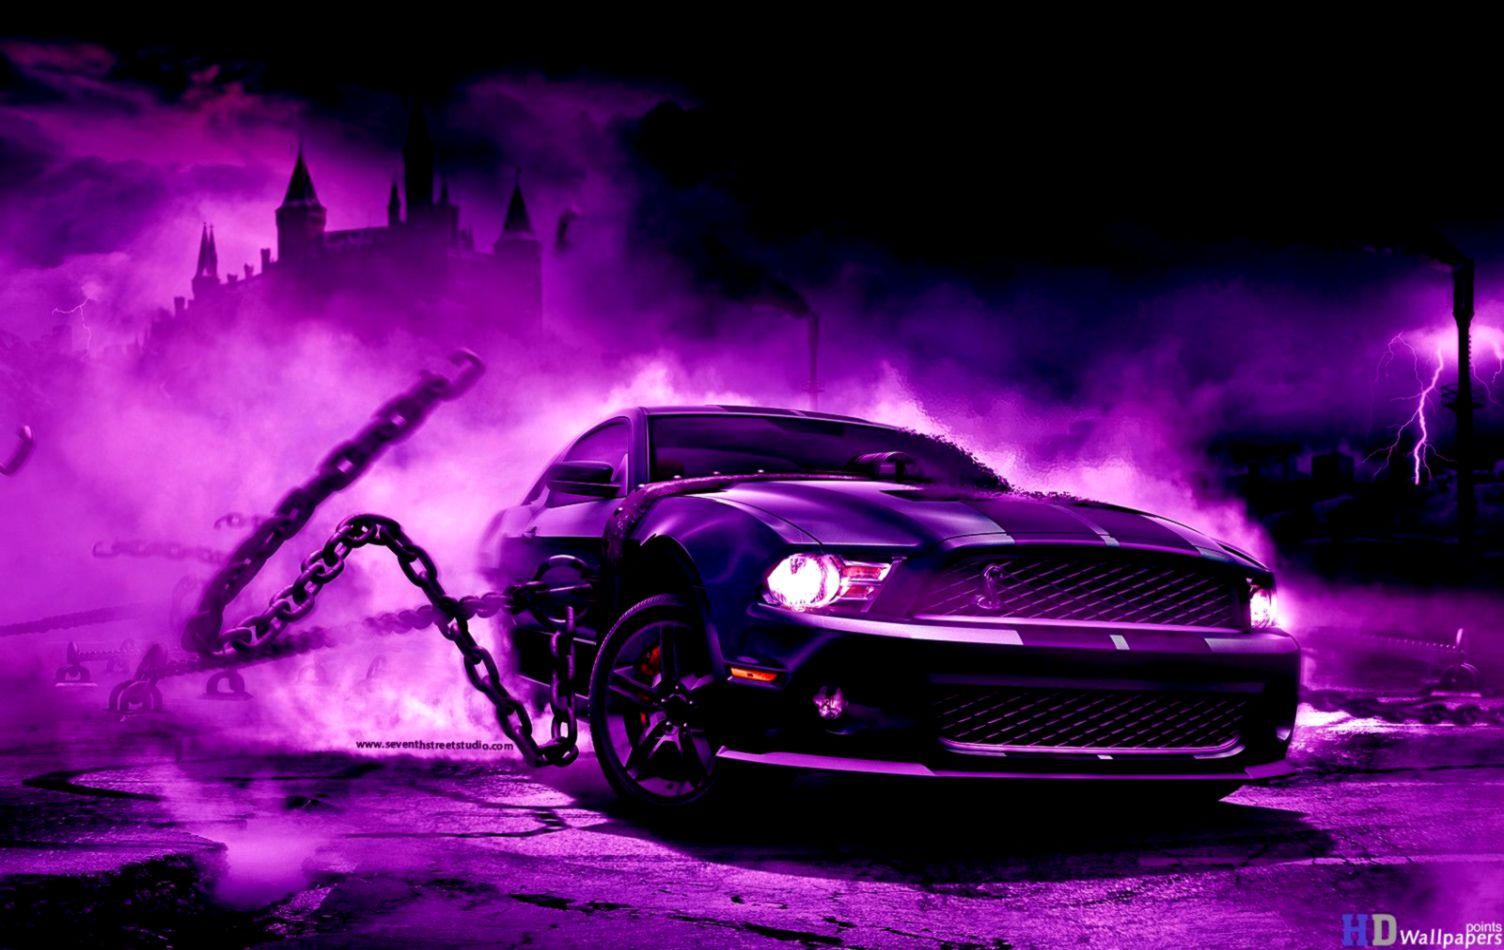 Cool Car 3d Wallpapers HD Background Desktop 14500 Wallpaper